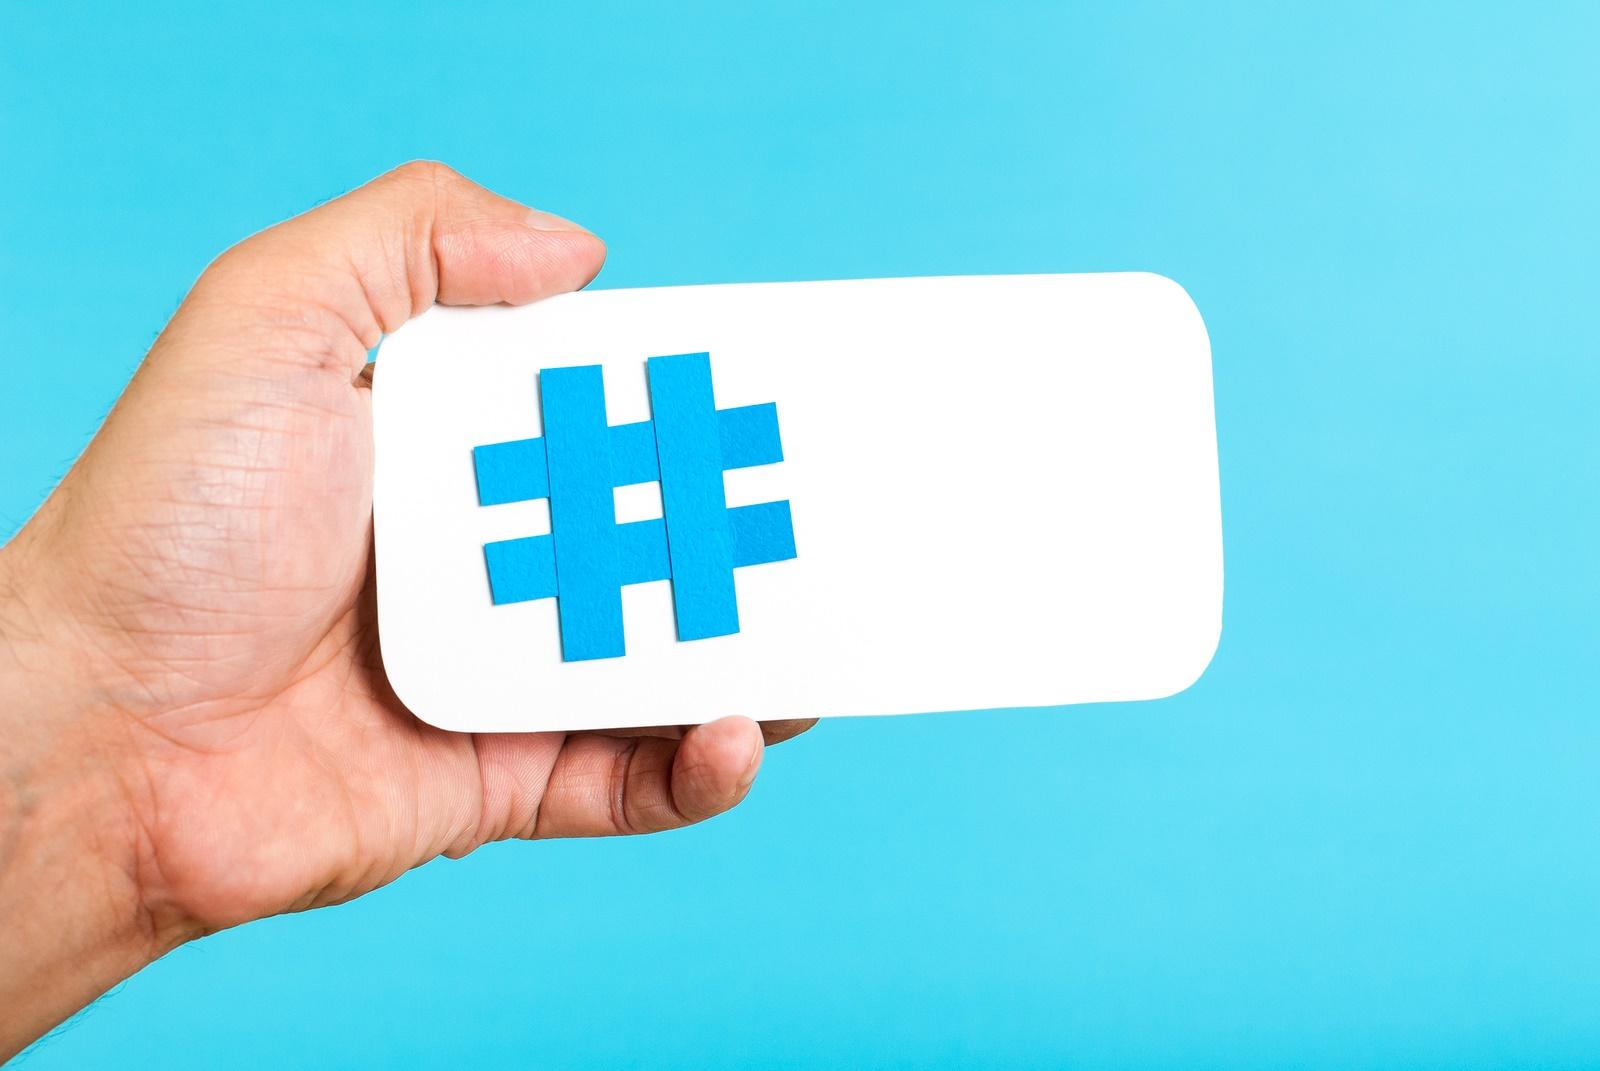 Al final, ¿los hashtags en Twitter no eran tan útiles?